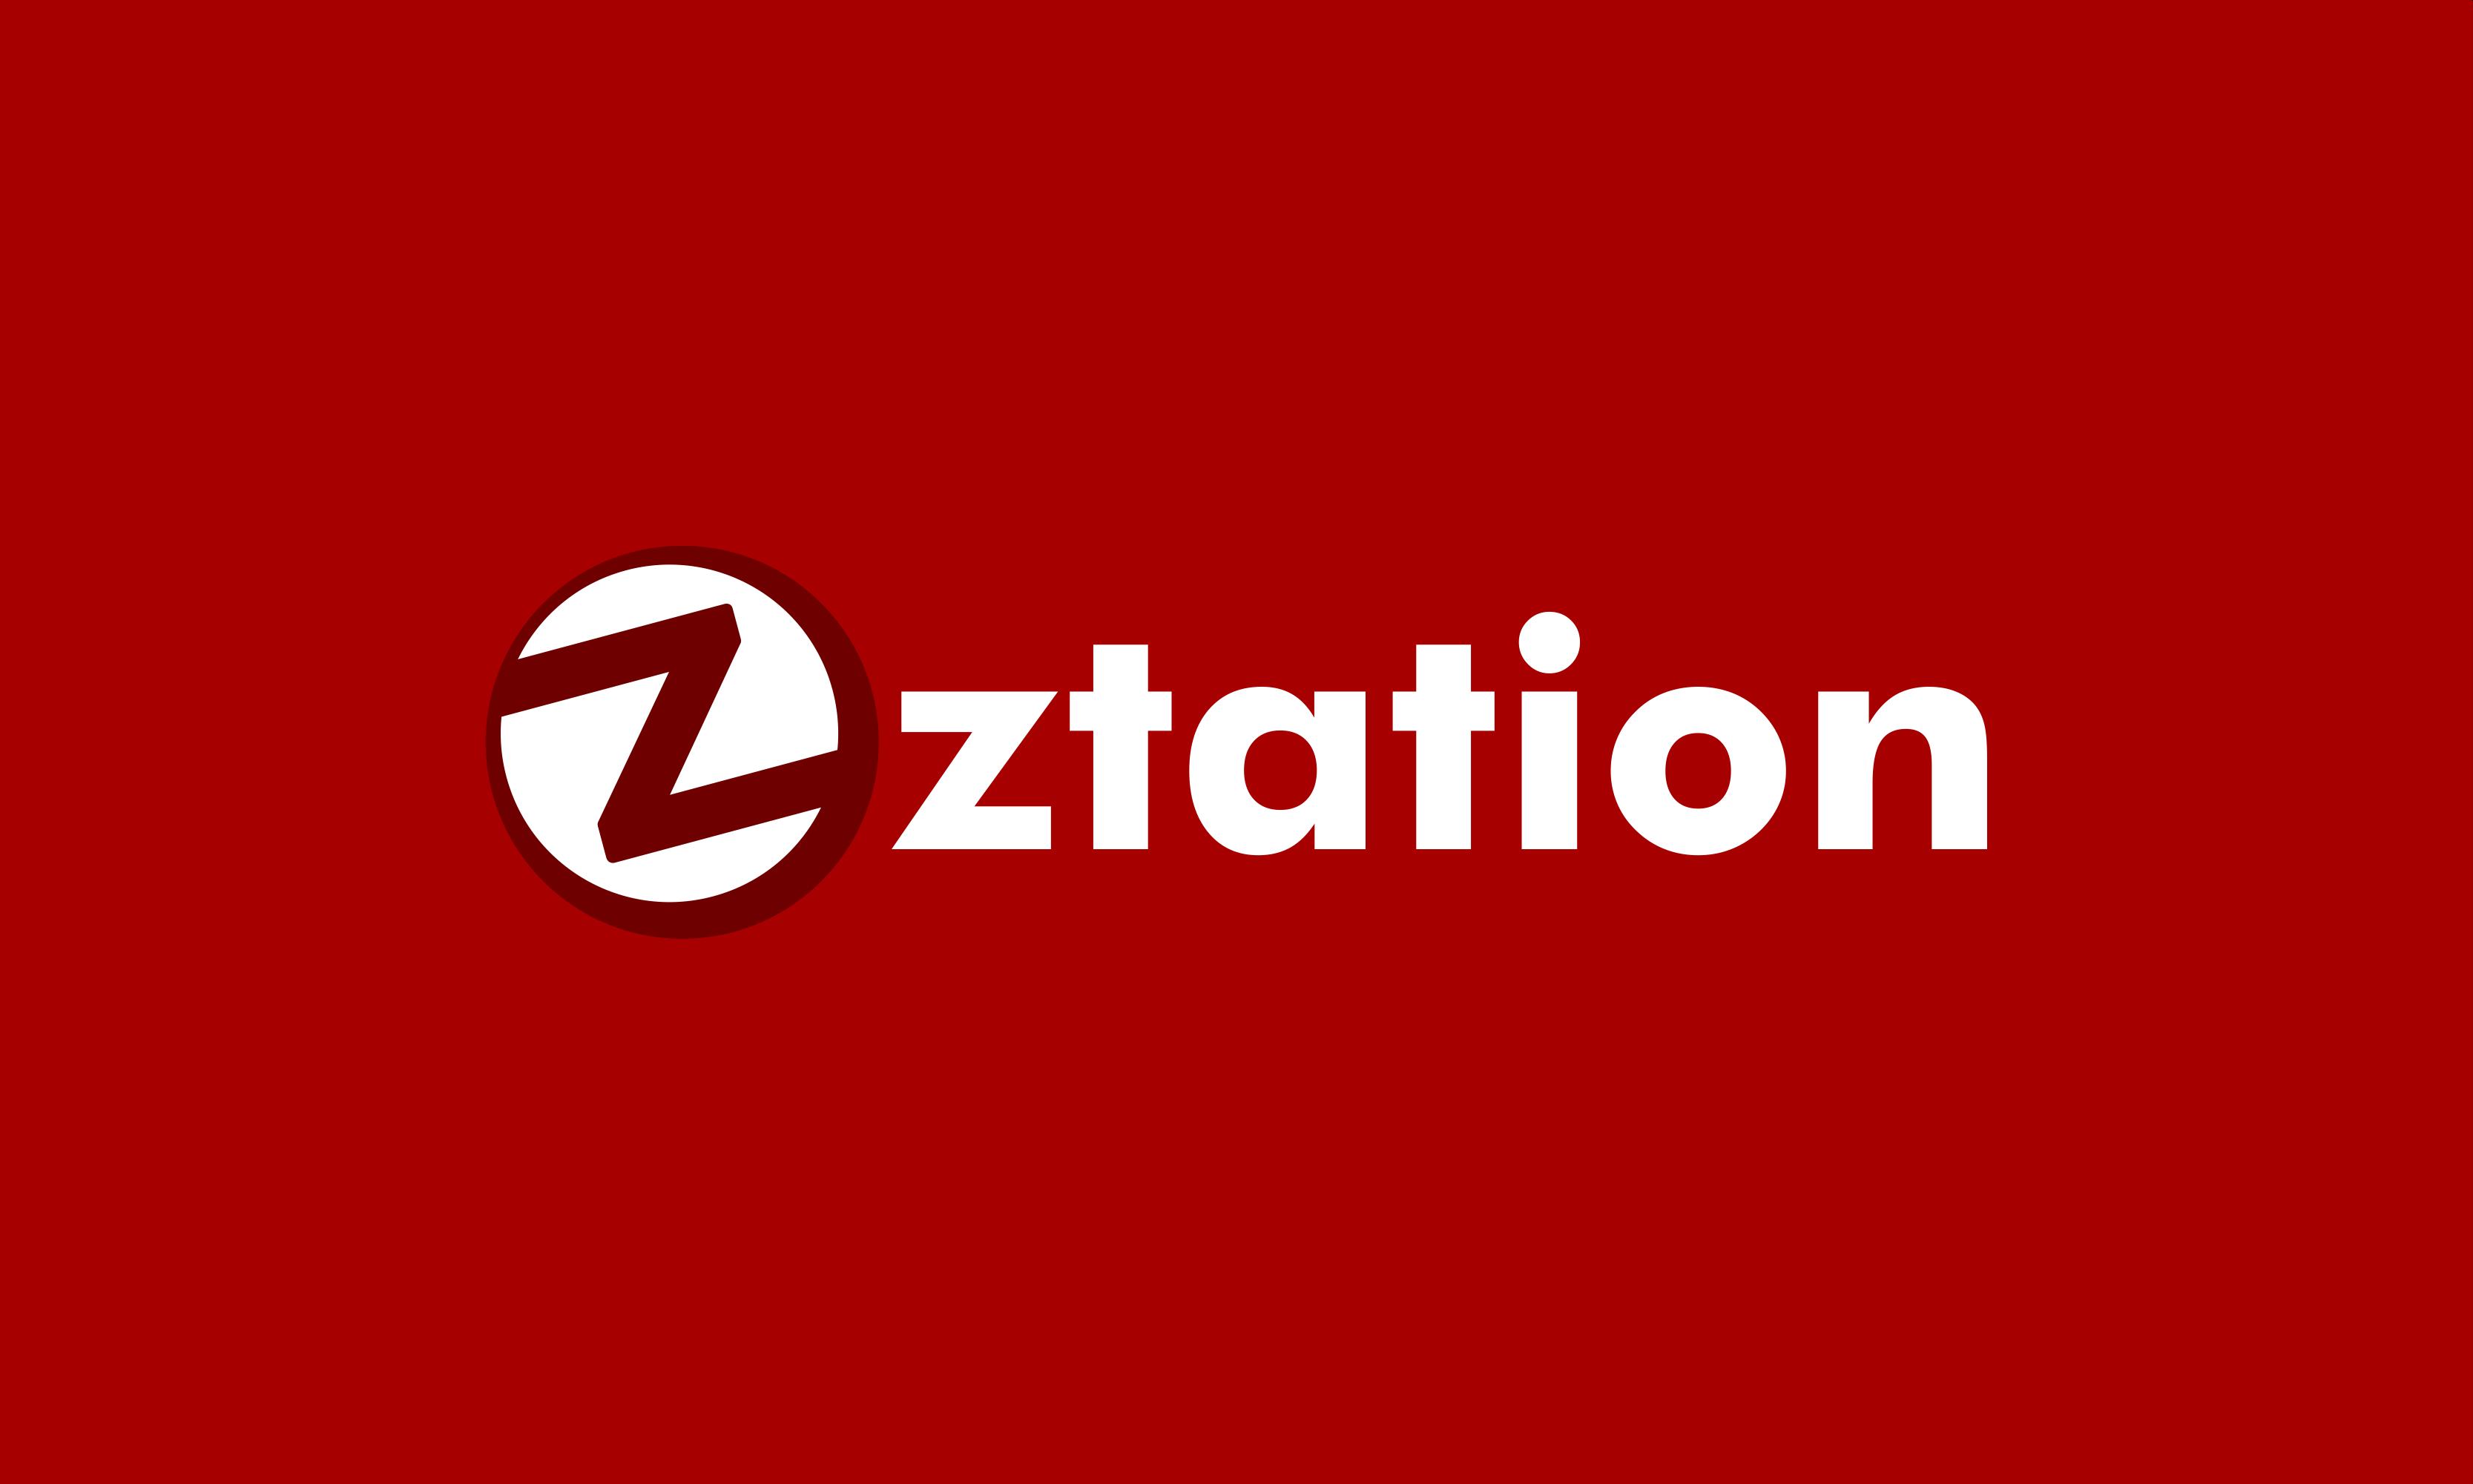 Ztation